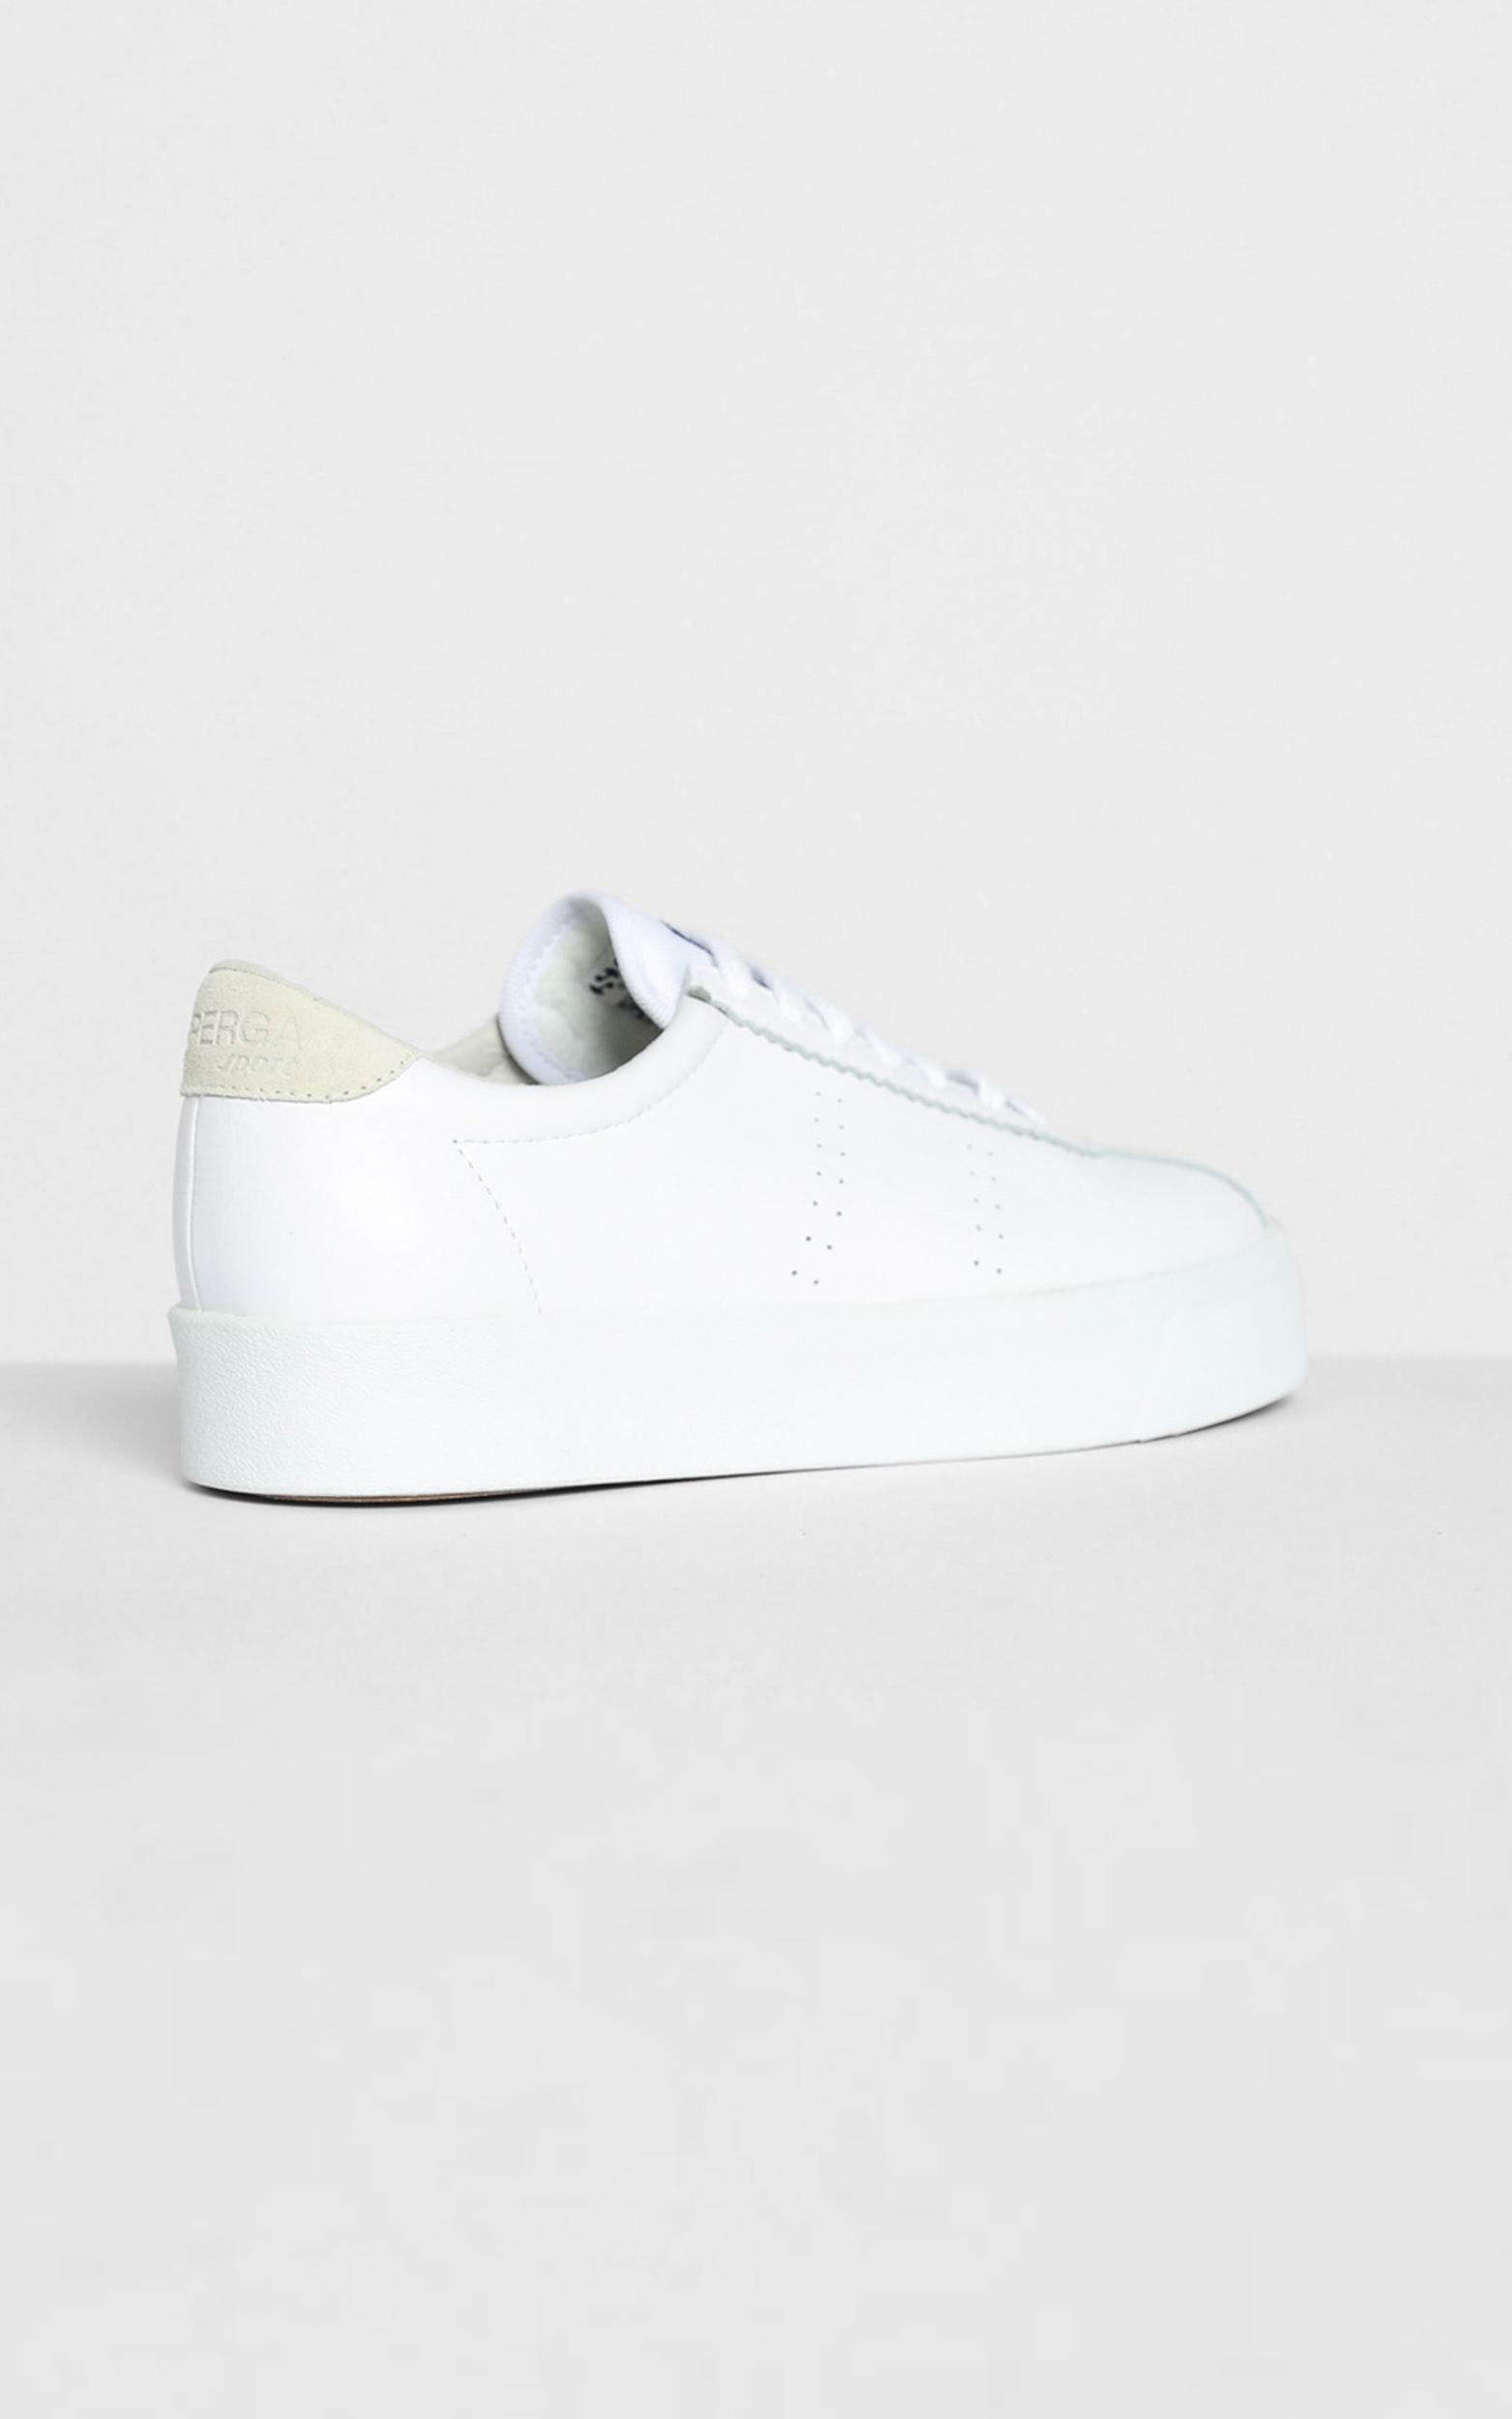 Superga - 2854 Club3 Leasuew Sneakers in White Beige LT Sand - 5, Beige, hi-res image number null